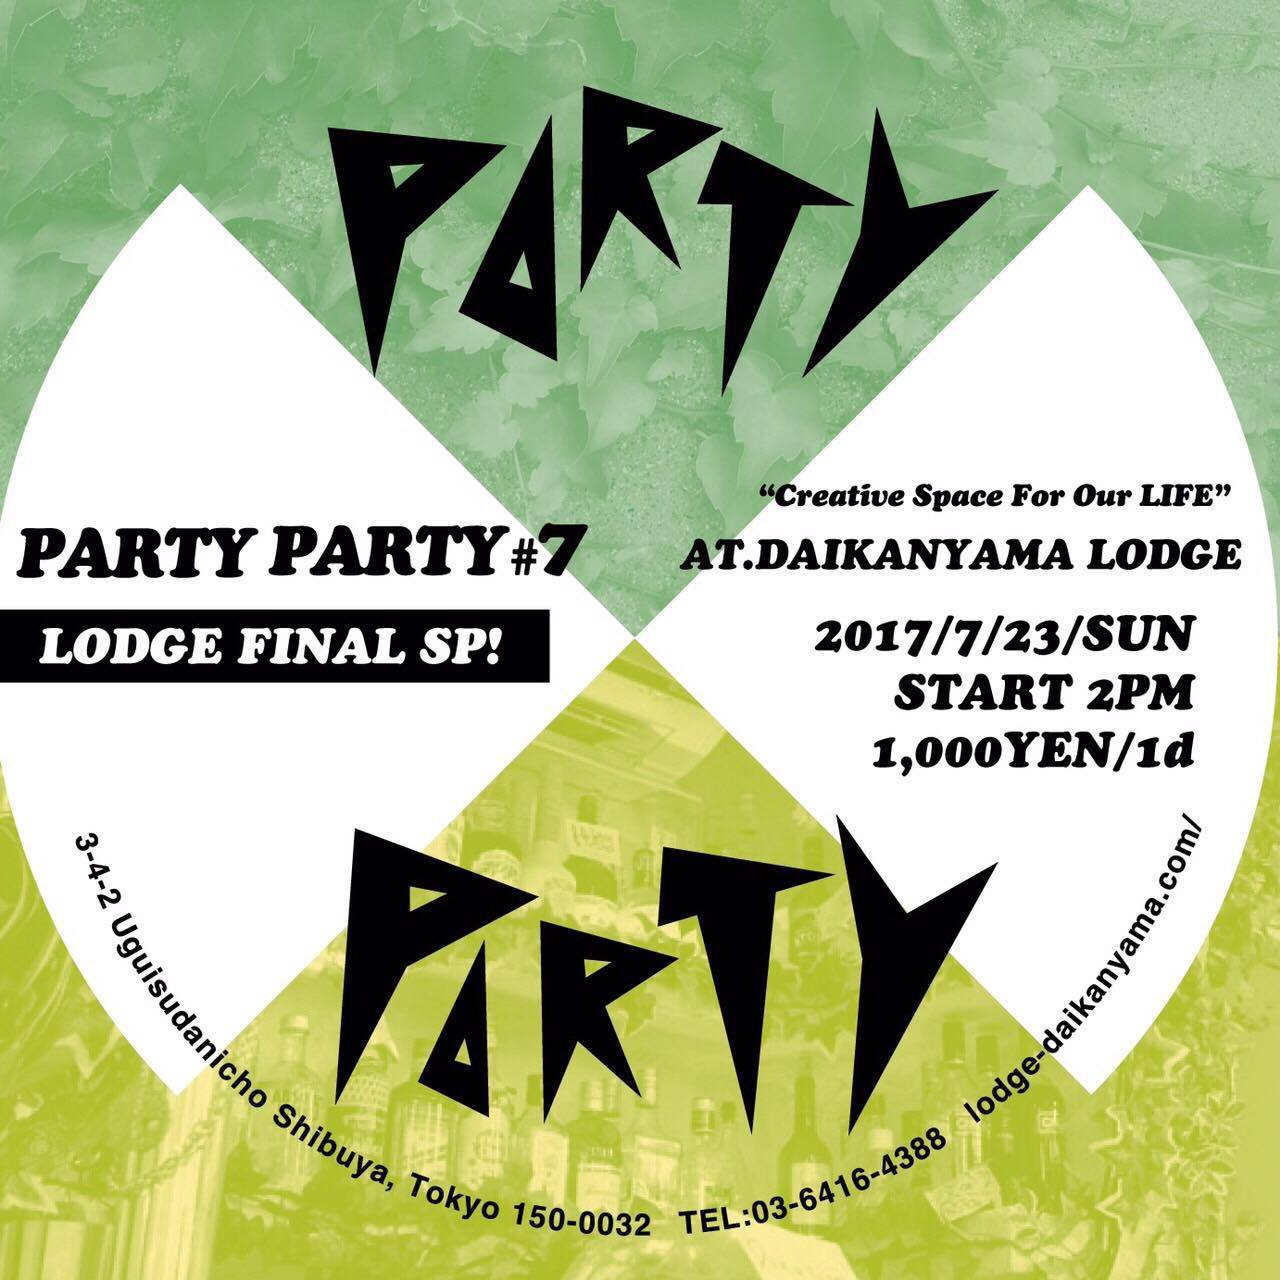 PARTYPARTY #7 代官山LODGE FINAL特別企画 DATE:2017.7.23(日)14:00-23:30 LOCATION:渋谷代官山エリア(Daikanyama LODGE,煮込みDaining,PELLS CAFE)